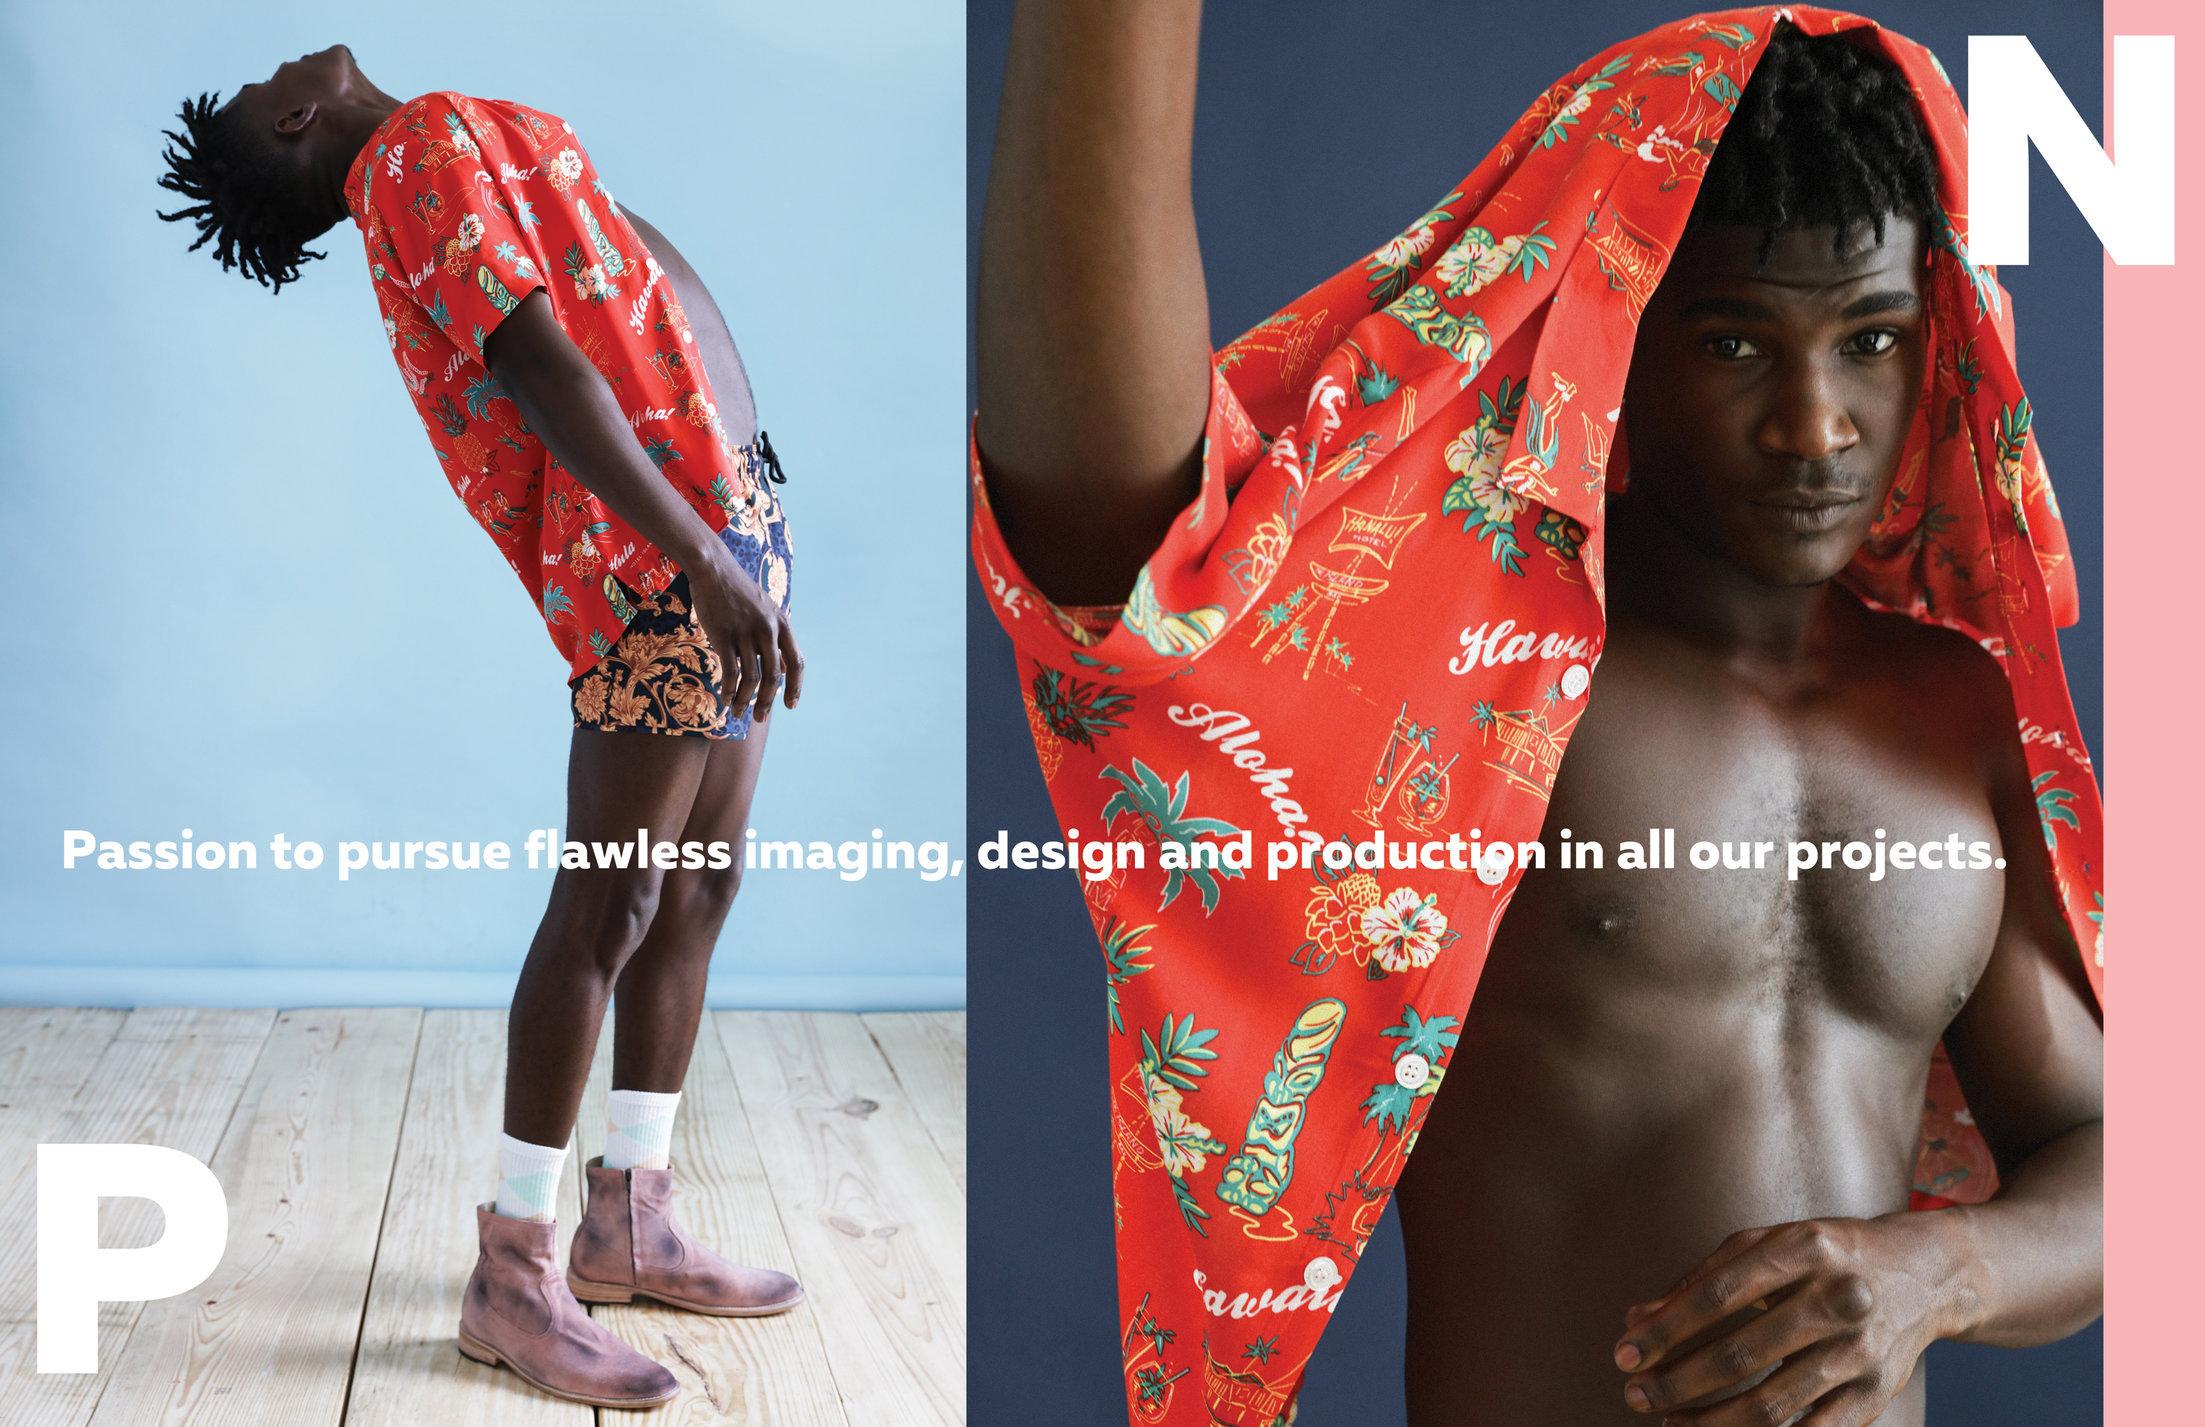 trevor-front-models-miami-fashion-photographer-nico-stipcianos-miami-copy-3.jpg